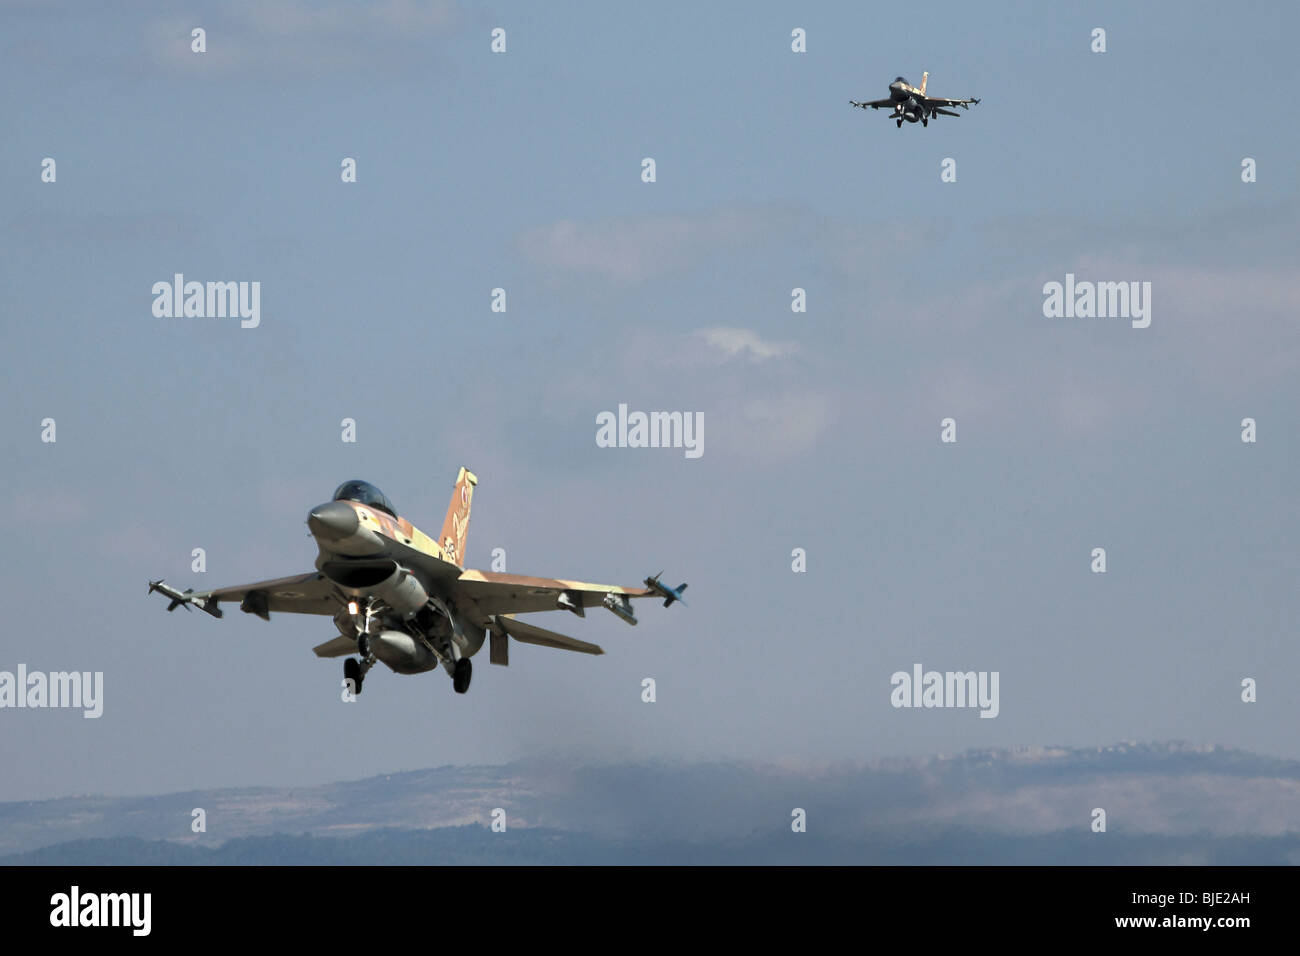 Israeli Air Force (IAF) F-16D Fighter jet in flight - Stock Image